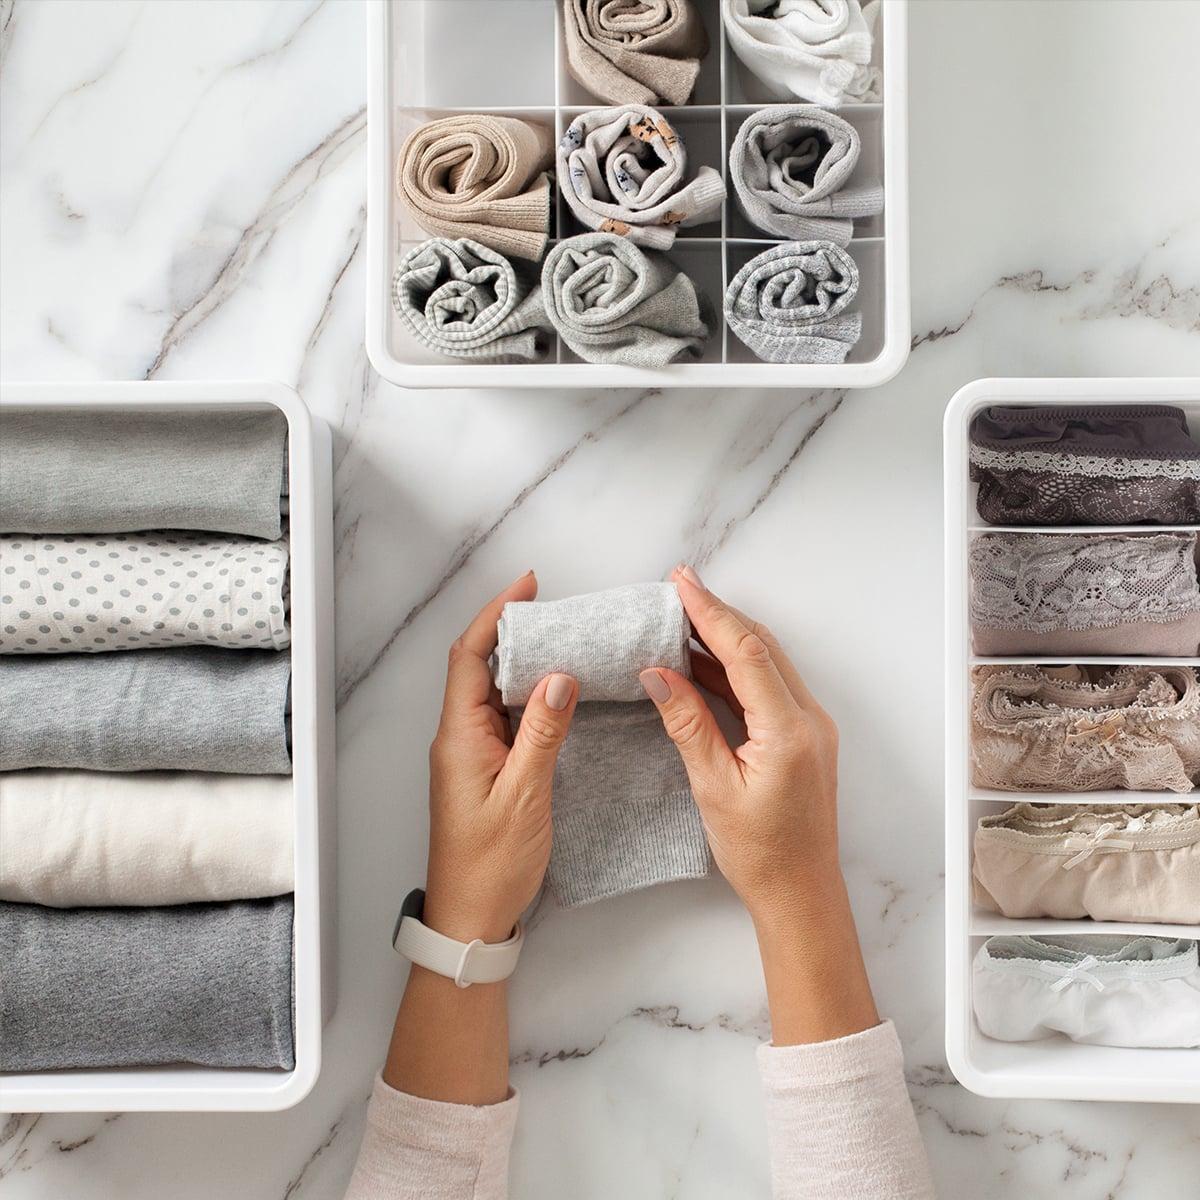 Frau legt Kleidungsstücke in Ablagebox